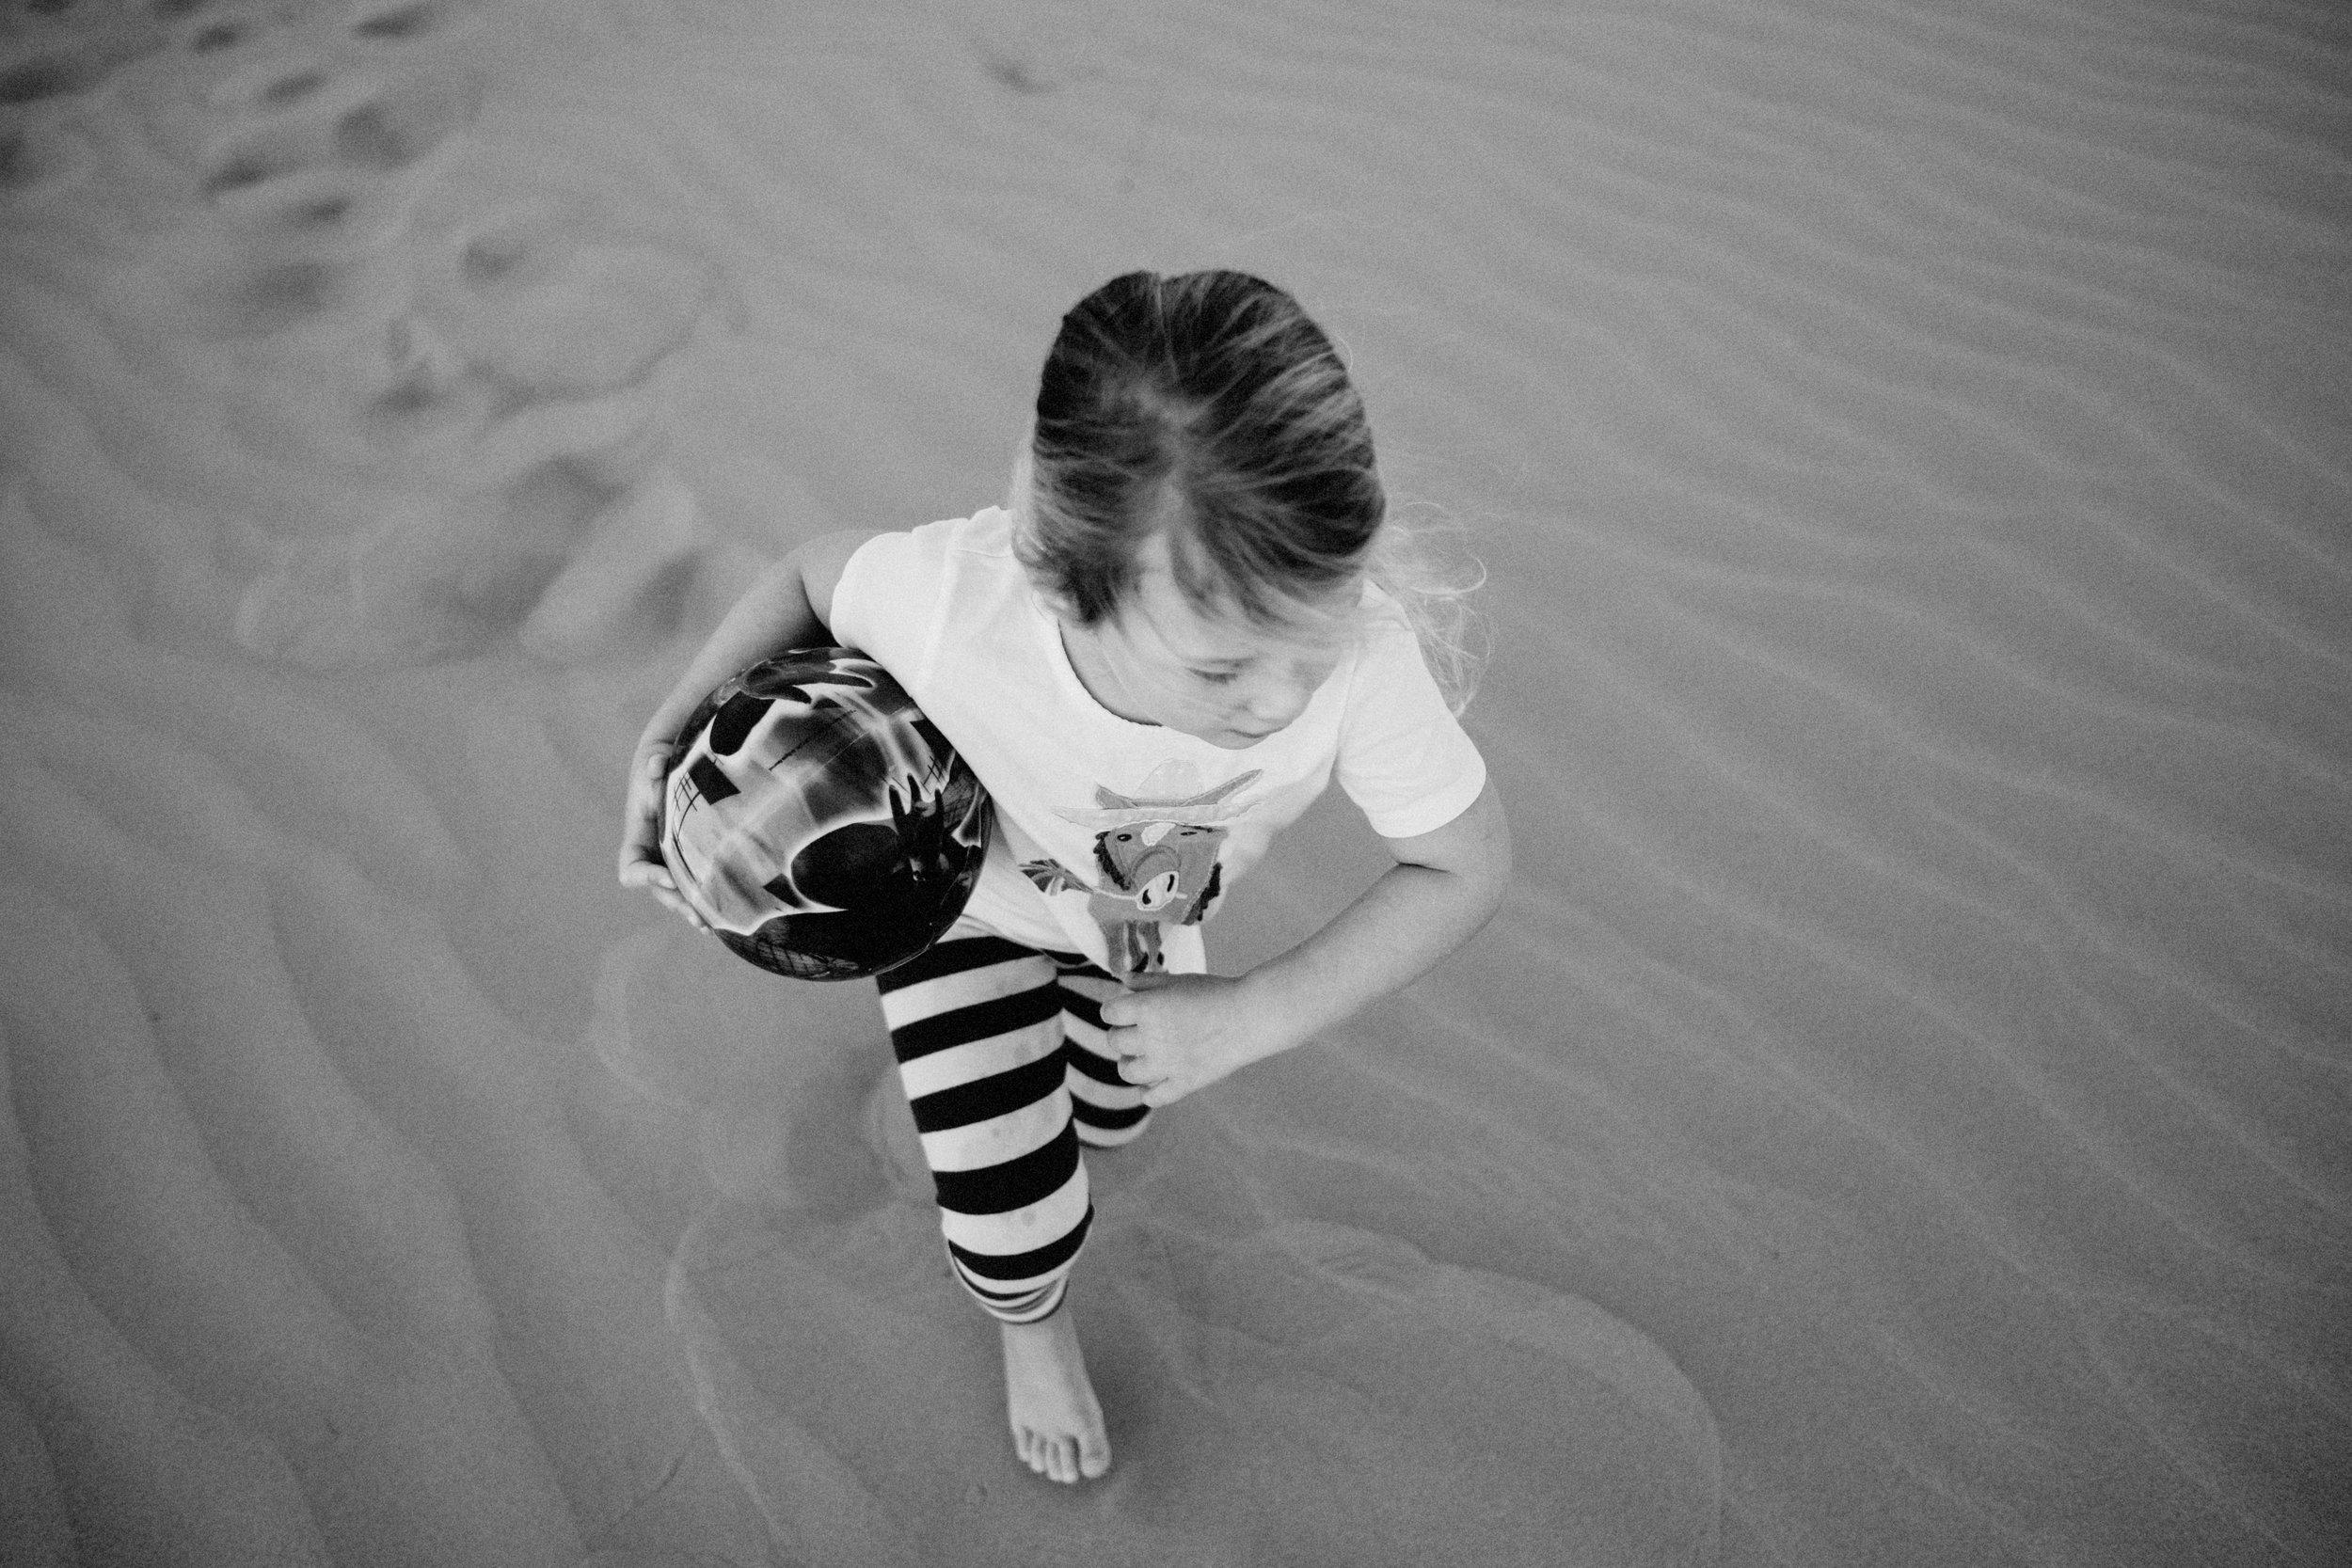 Girl runs on sand holding a ball